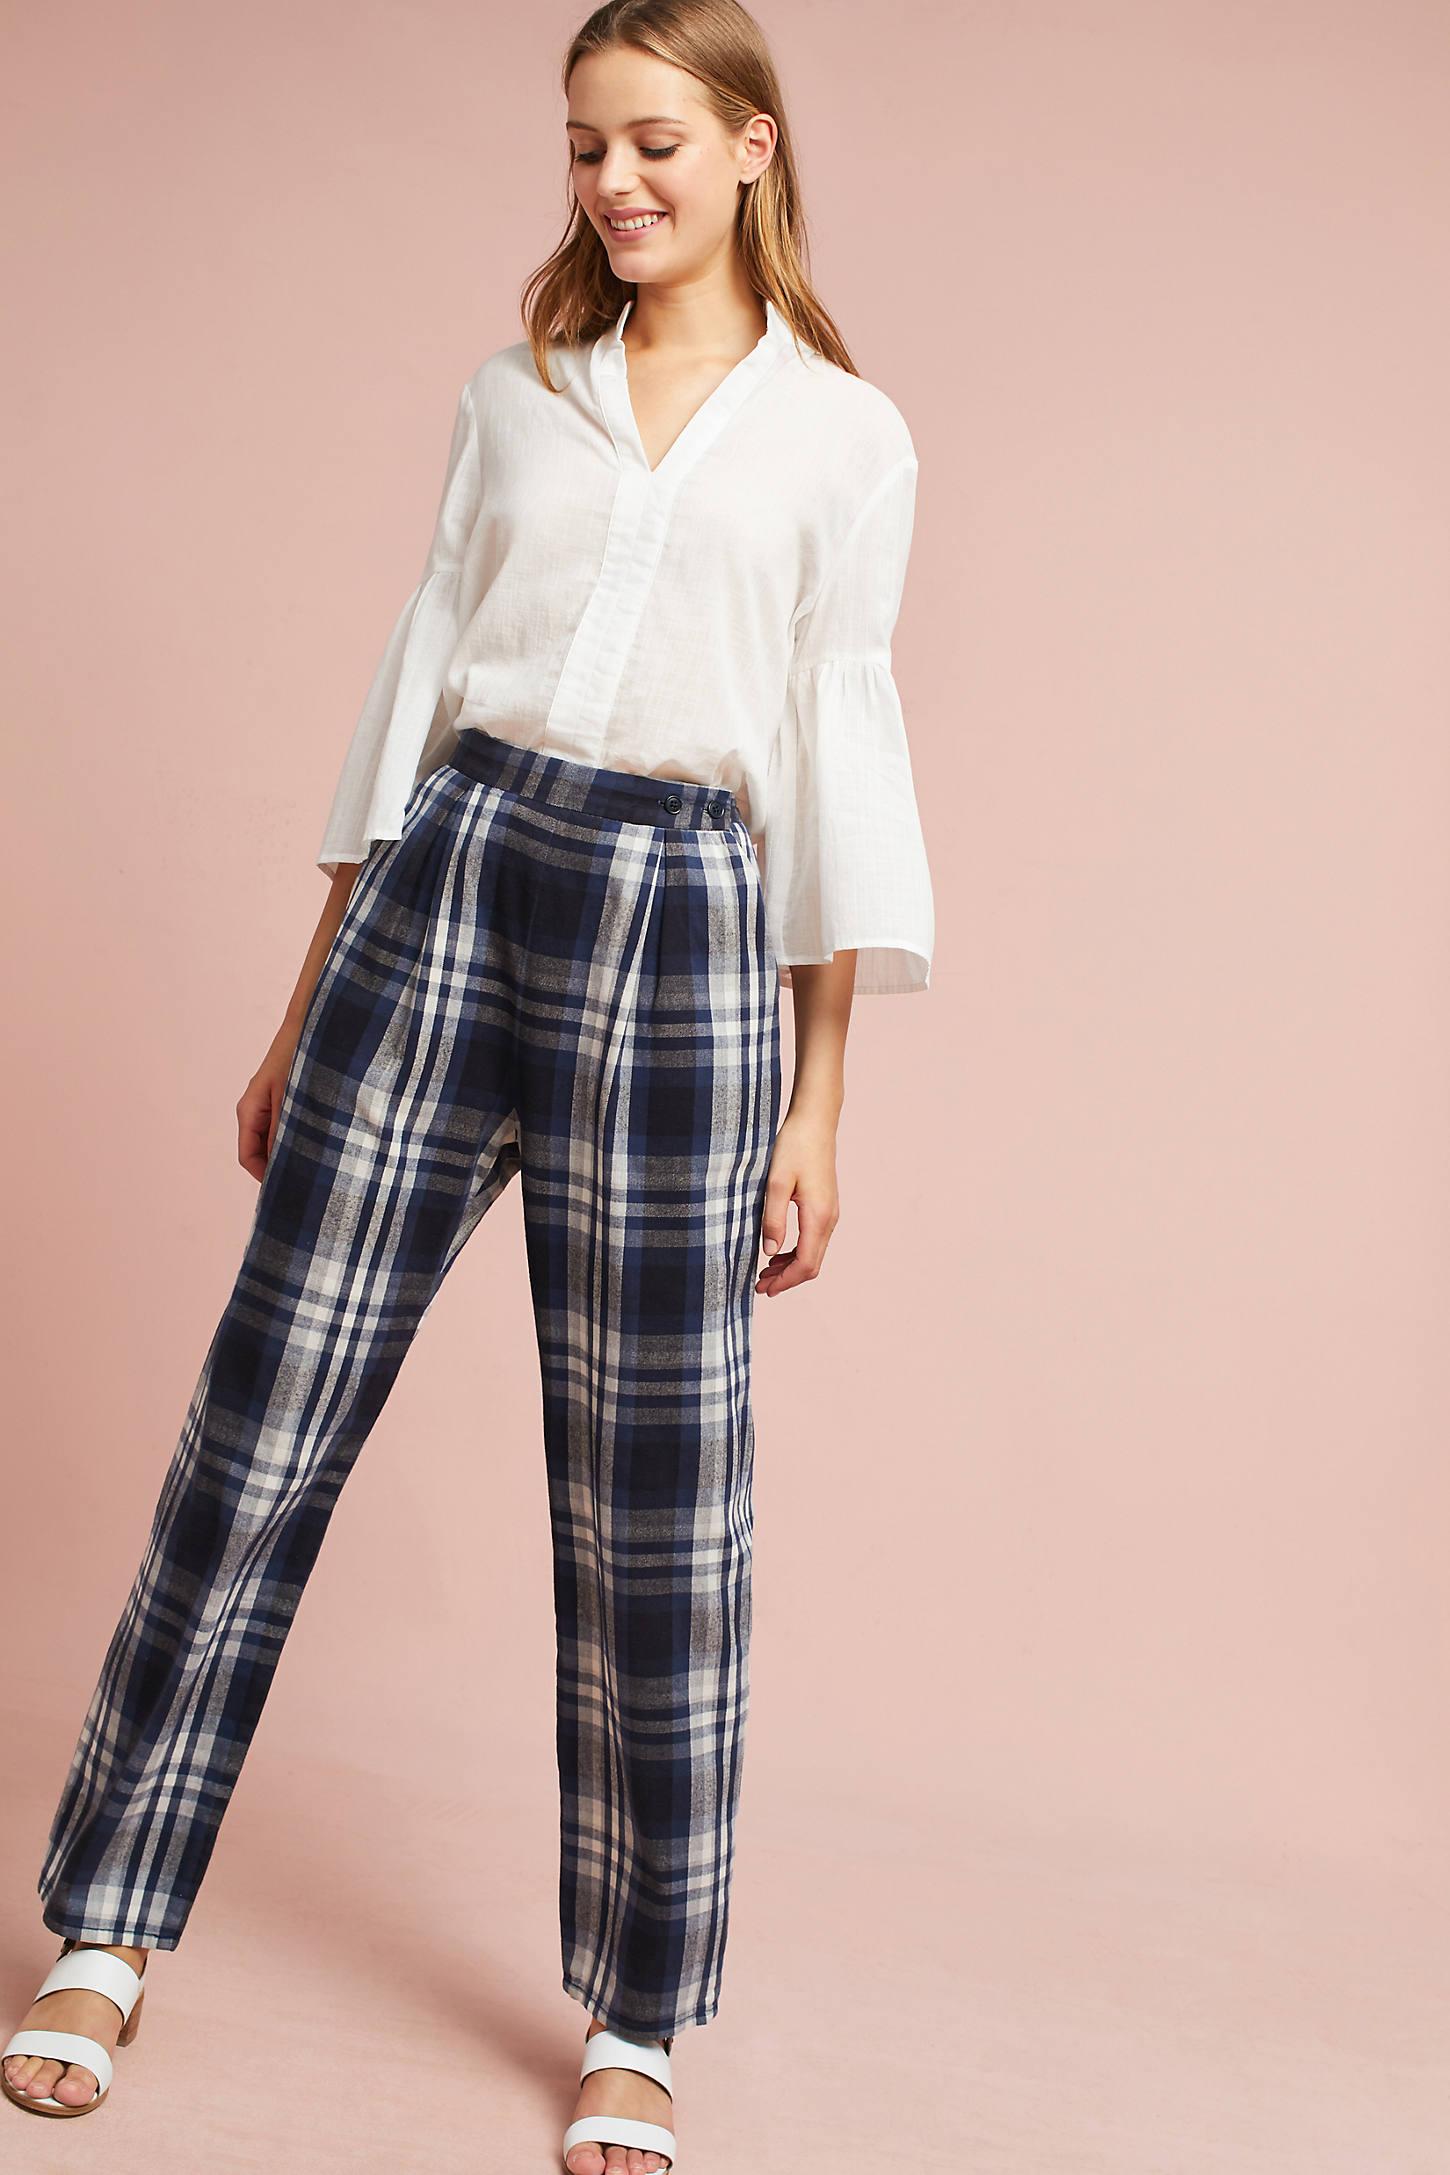 3x1 NYC Plaid Pants